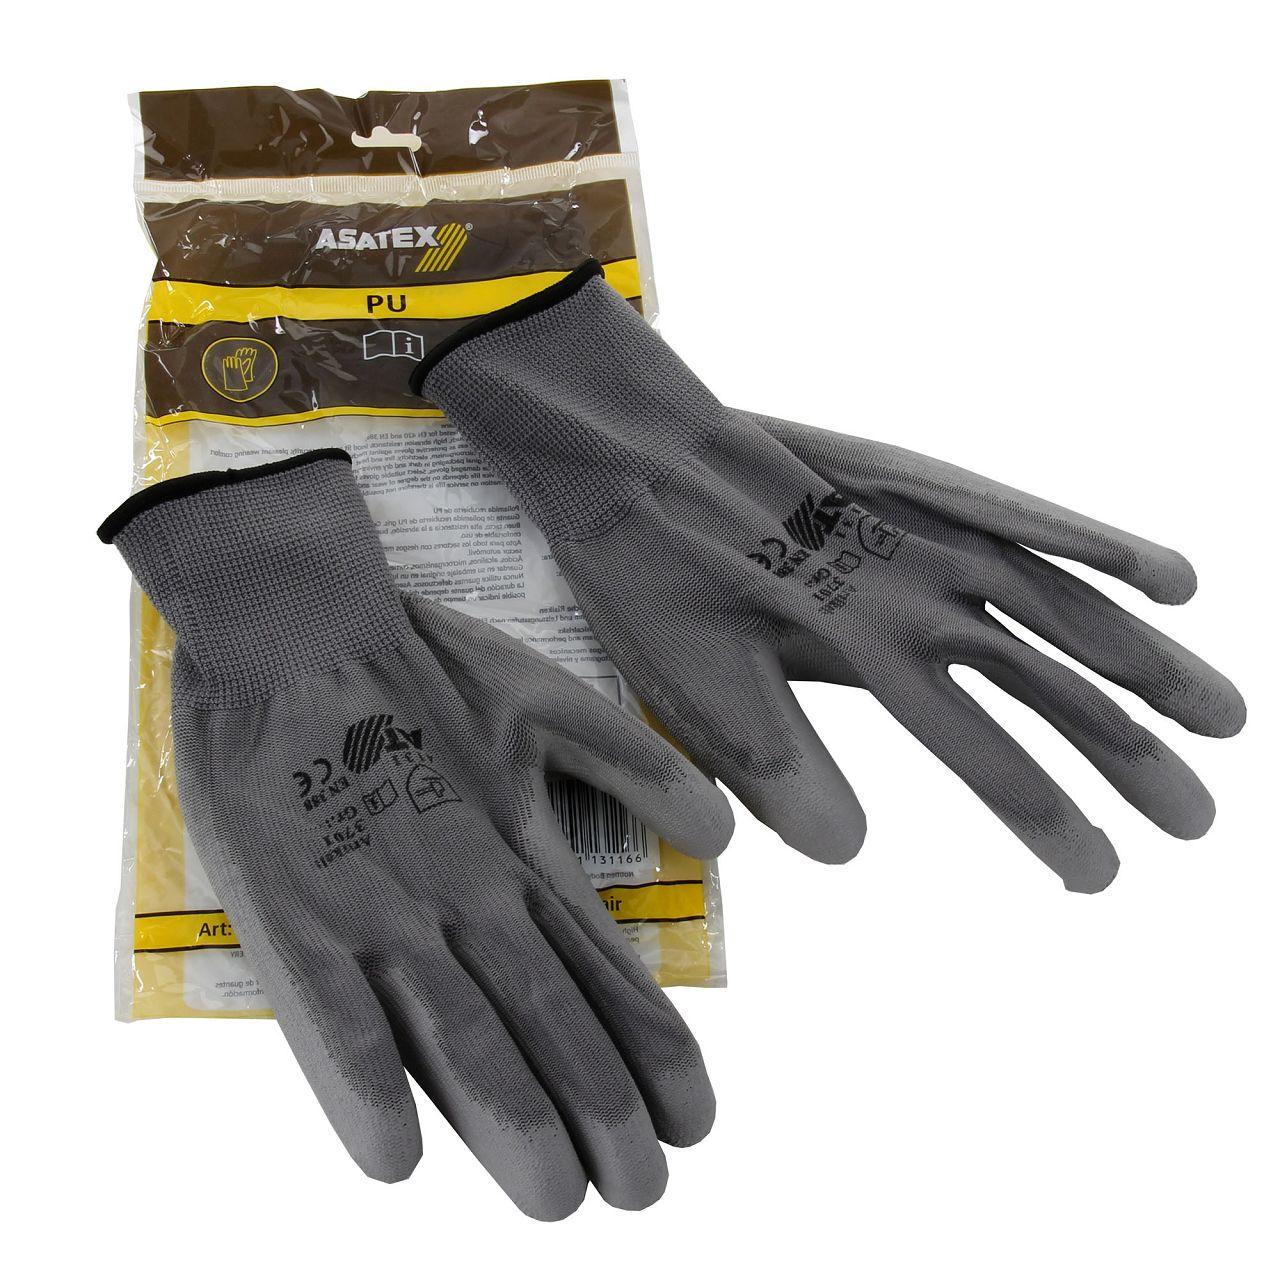 ASATEX 3701 Handschuhe Arbeitshandschuhe GUMMIERT - GRAU Größe 8 / M (1 Paar)